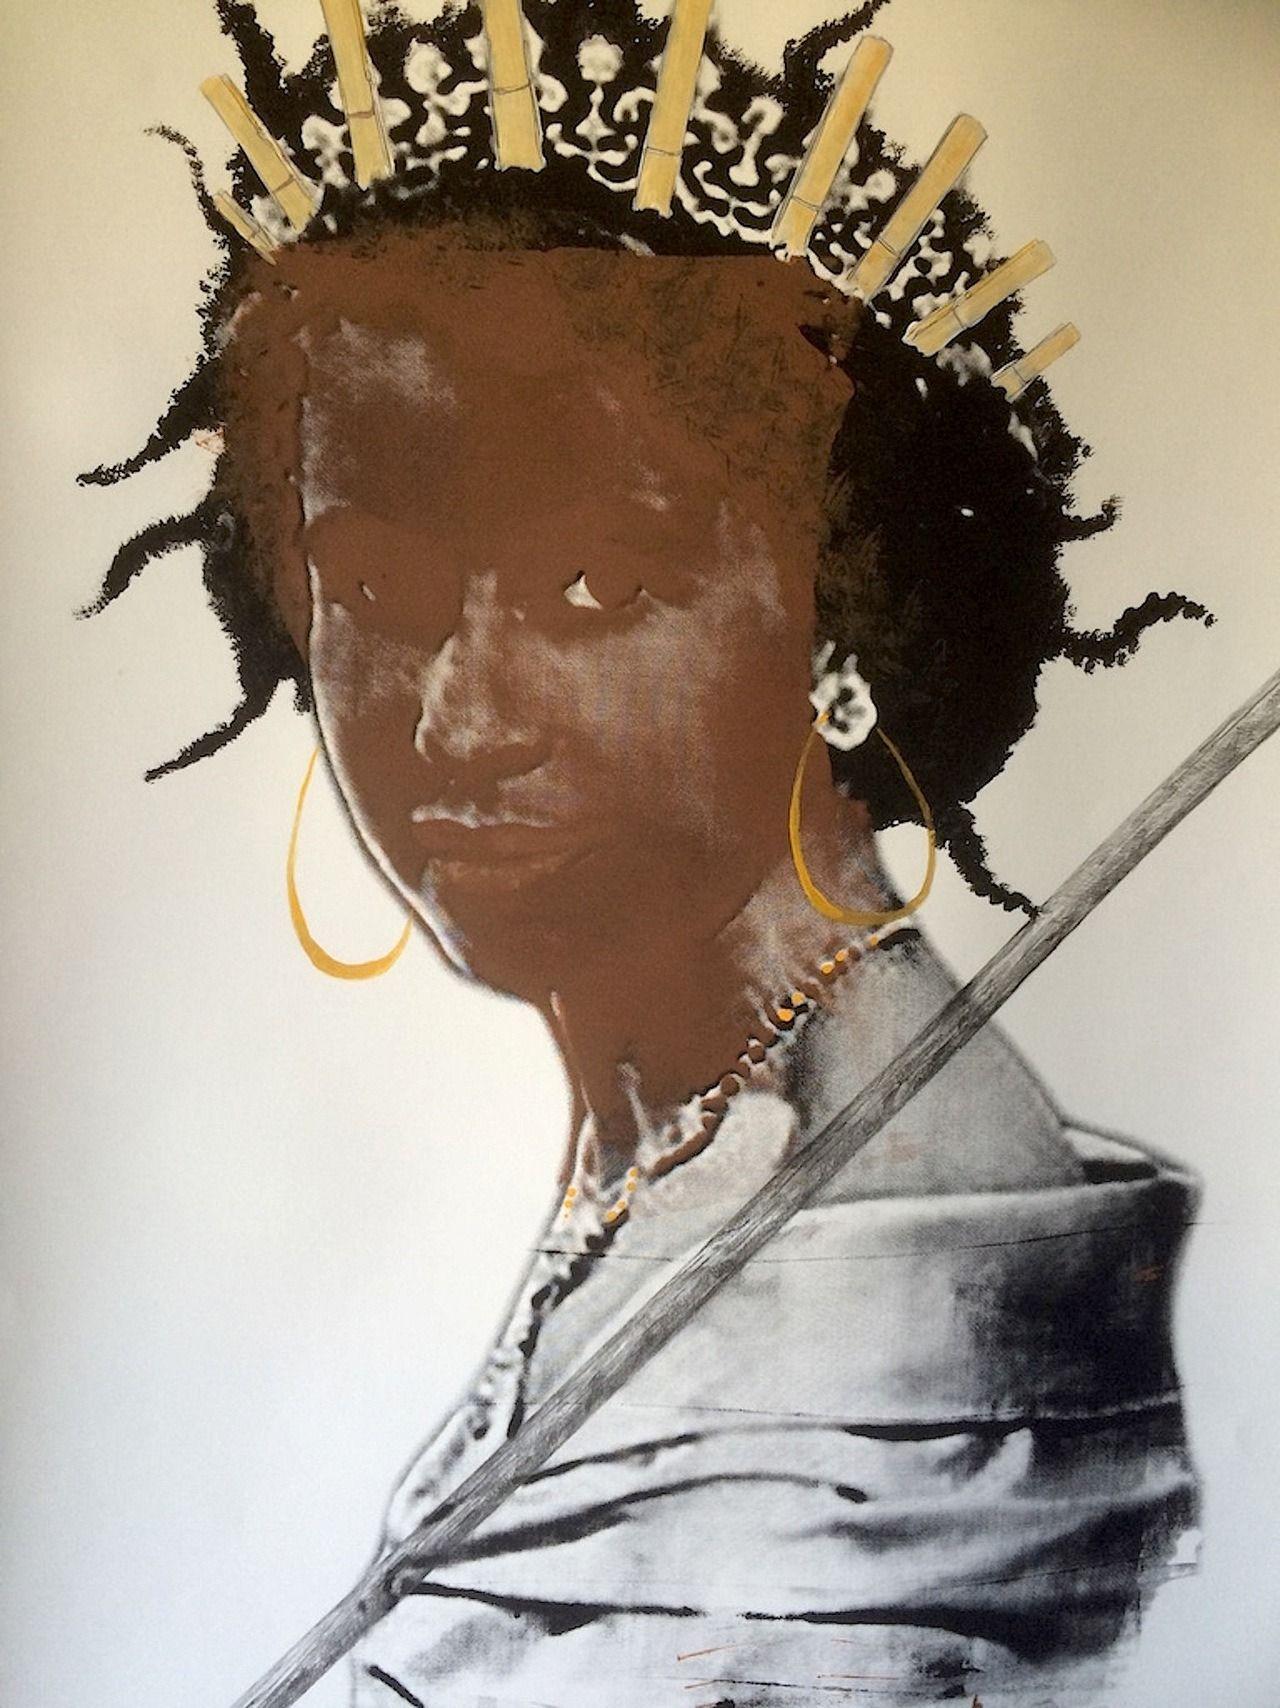 Deborah roberts deborah roberts art inspiration art